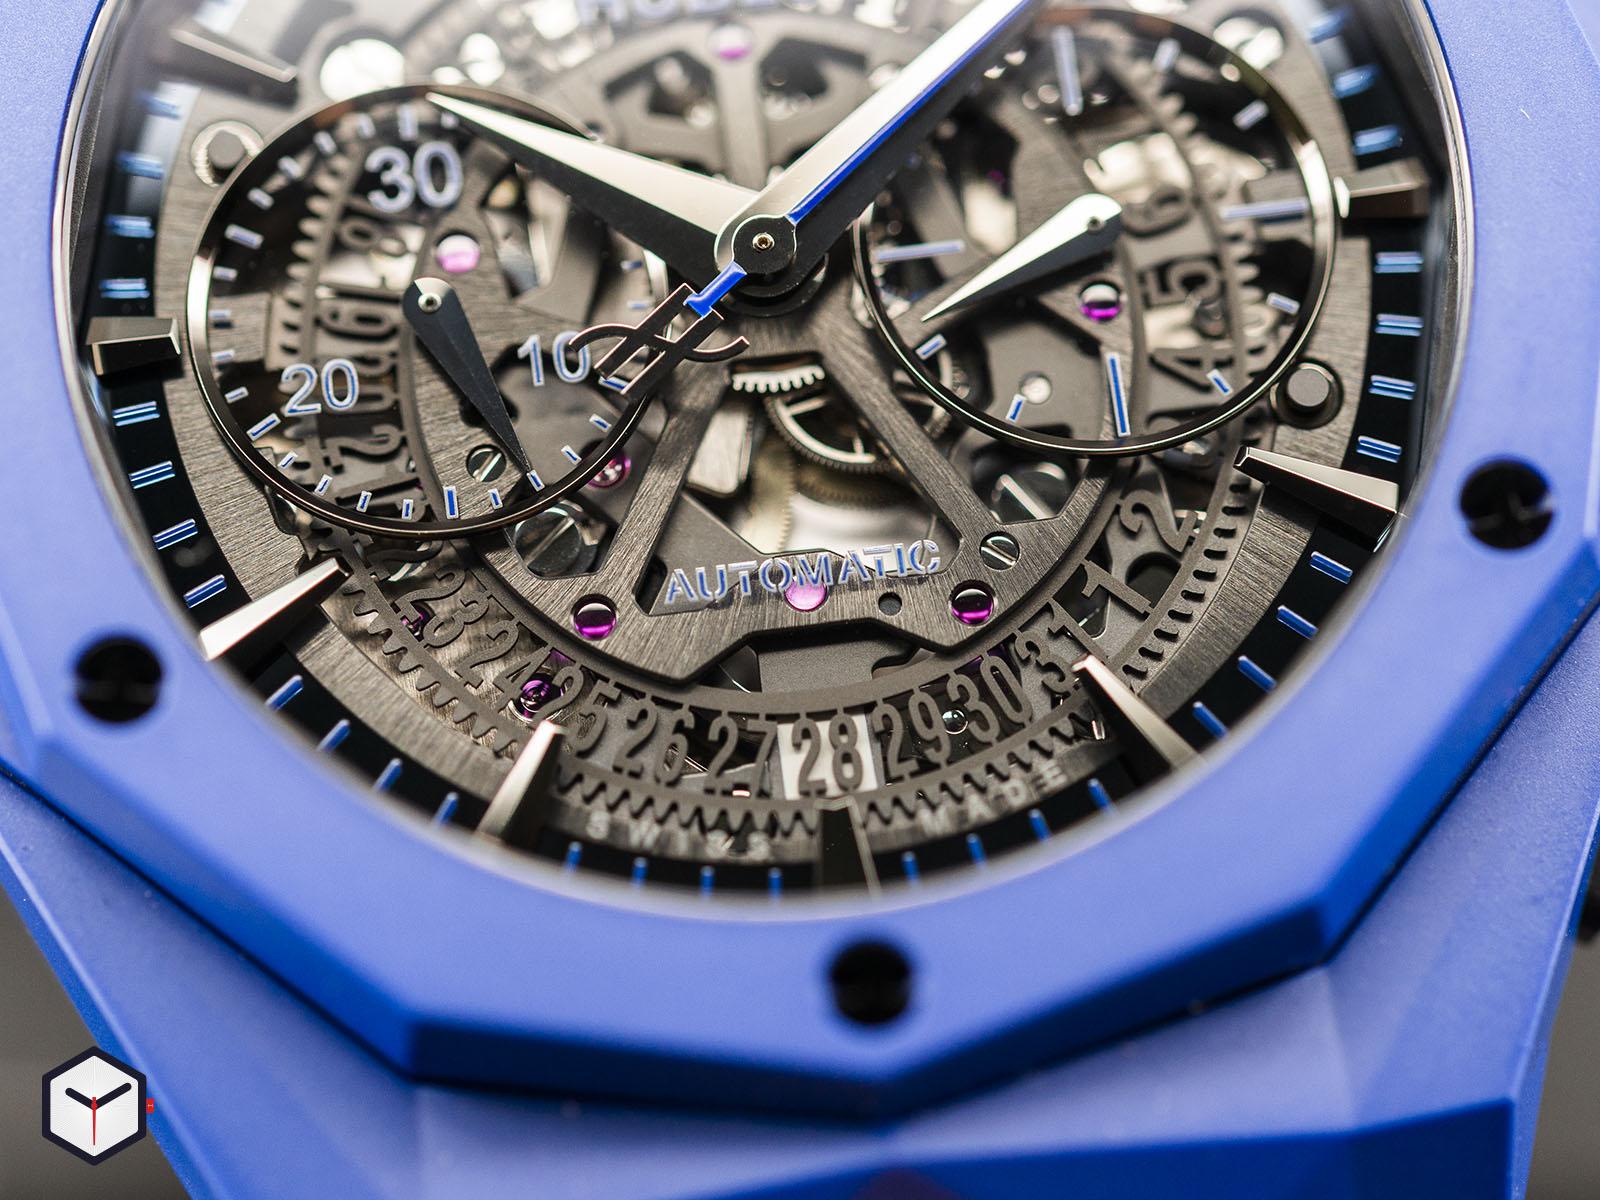 525-ex-0179-rx-orl18-hublot-aerofusion-chronograph-orlinski-blue-ceramic-4.jpg